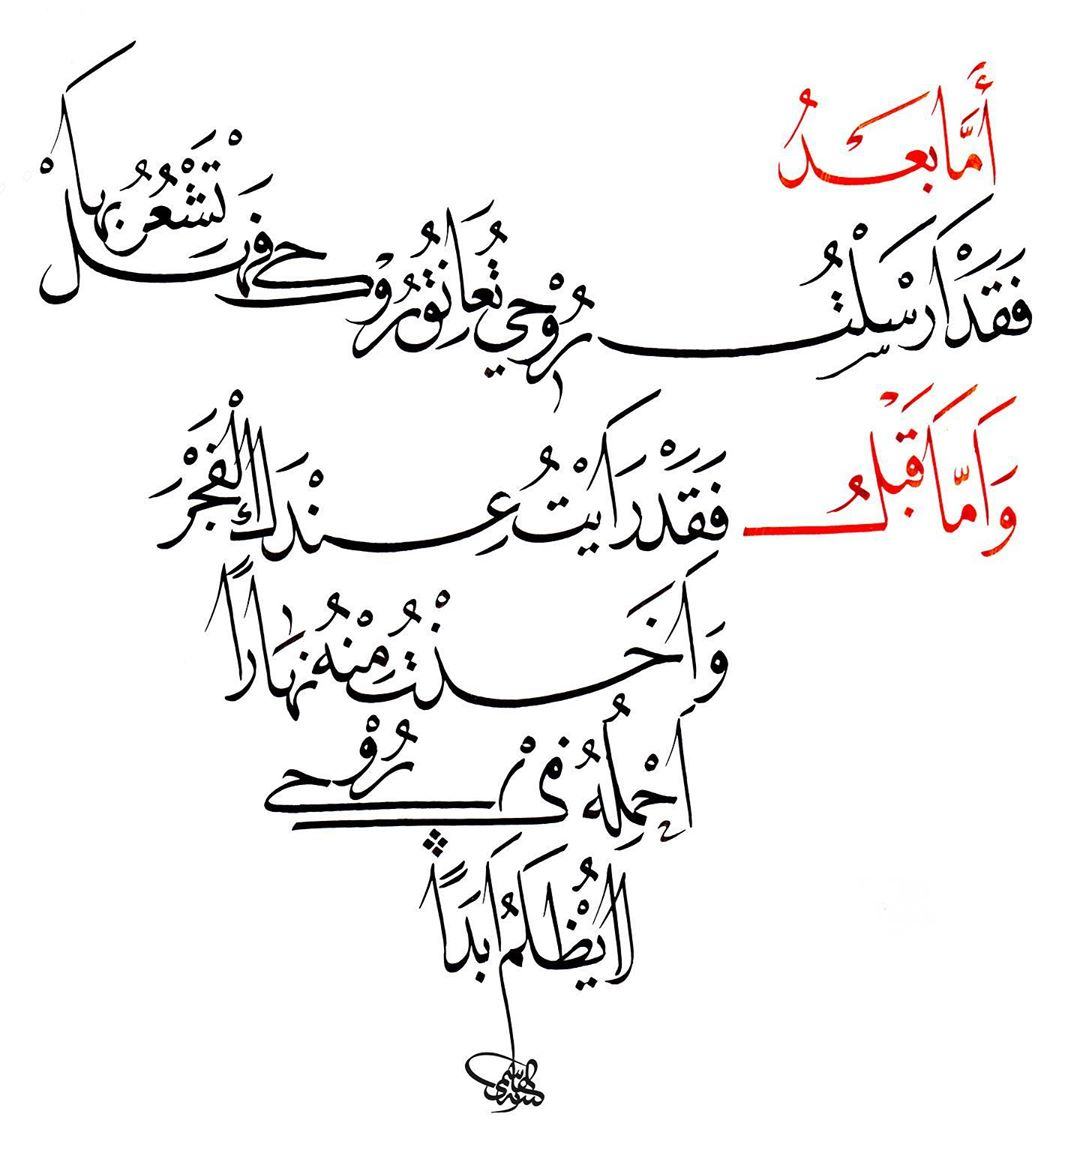 Khat Diwani Ajhalawani/Amr أما بعد - أما قبل . . . . . #arabiccalligraphy #arabicart #thinkverylittle #arab... 1099 1